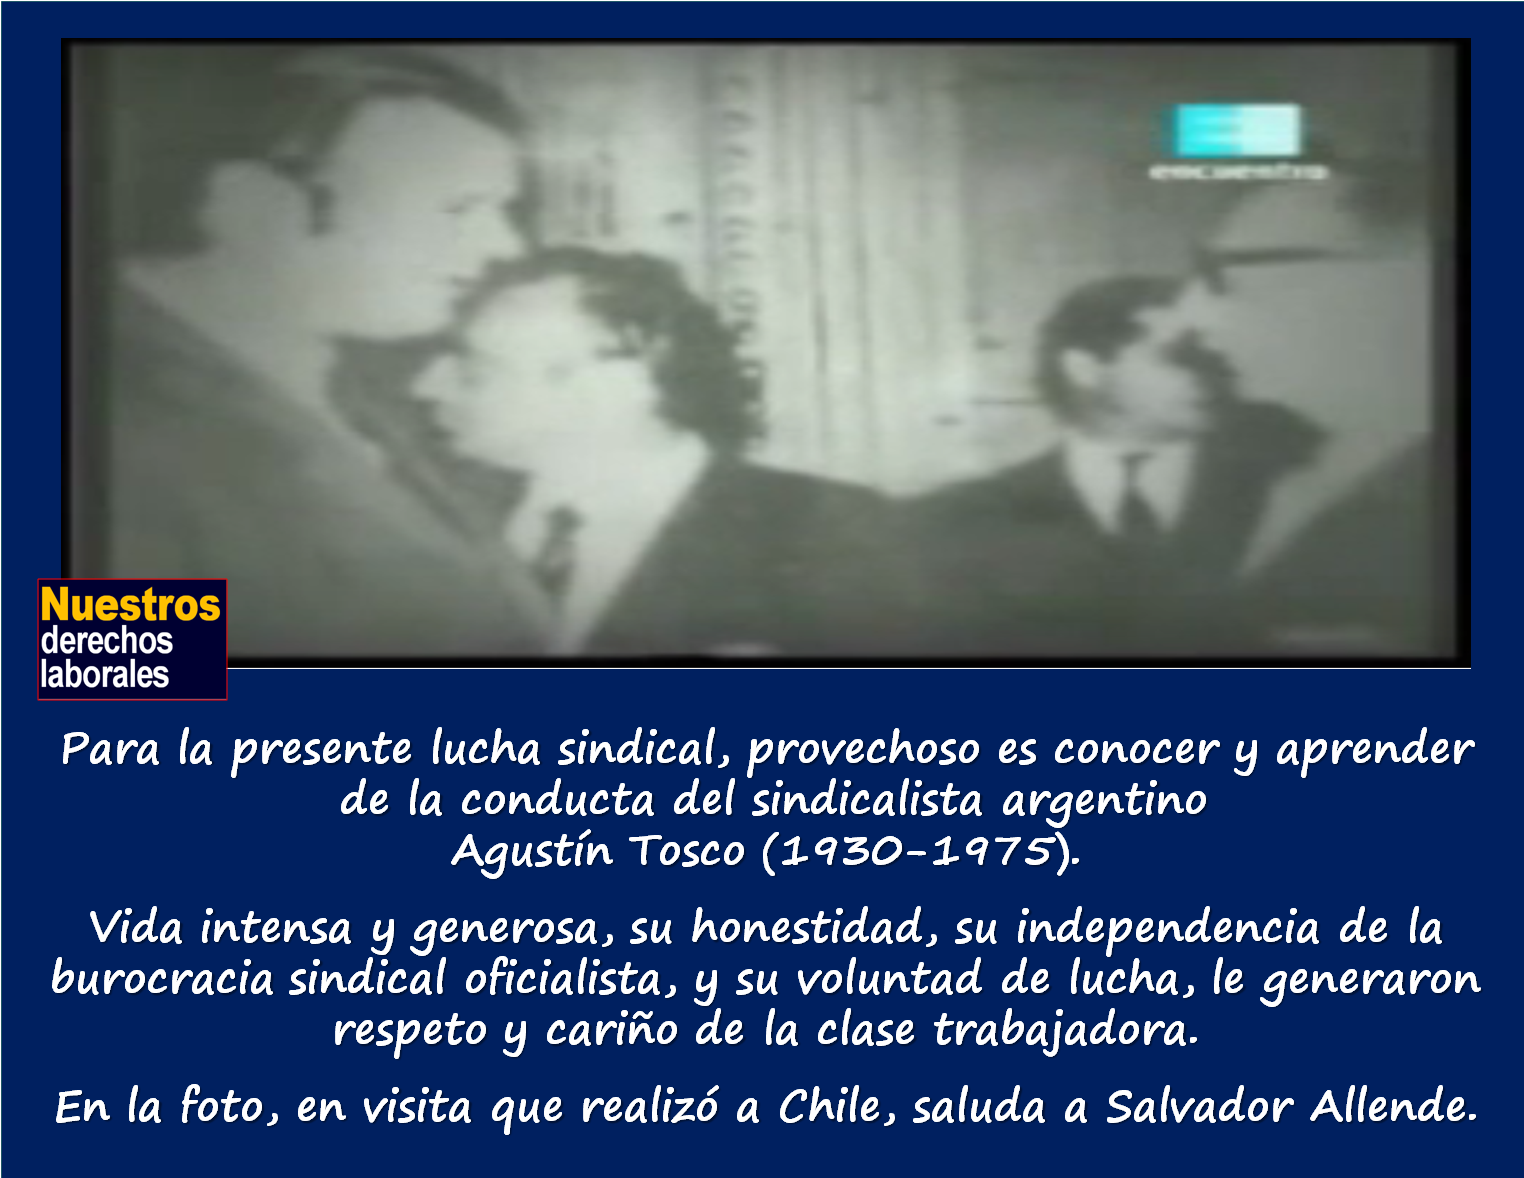 Agustín Tosco (1930-1975), sindicalista argentino, líder de la CGT autónoma.  Enlace a documental.